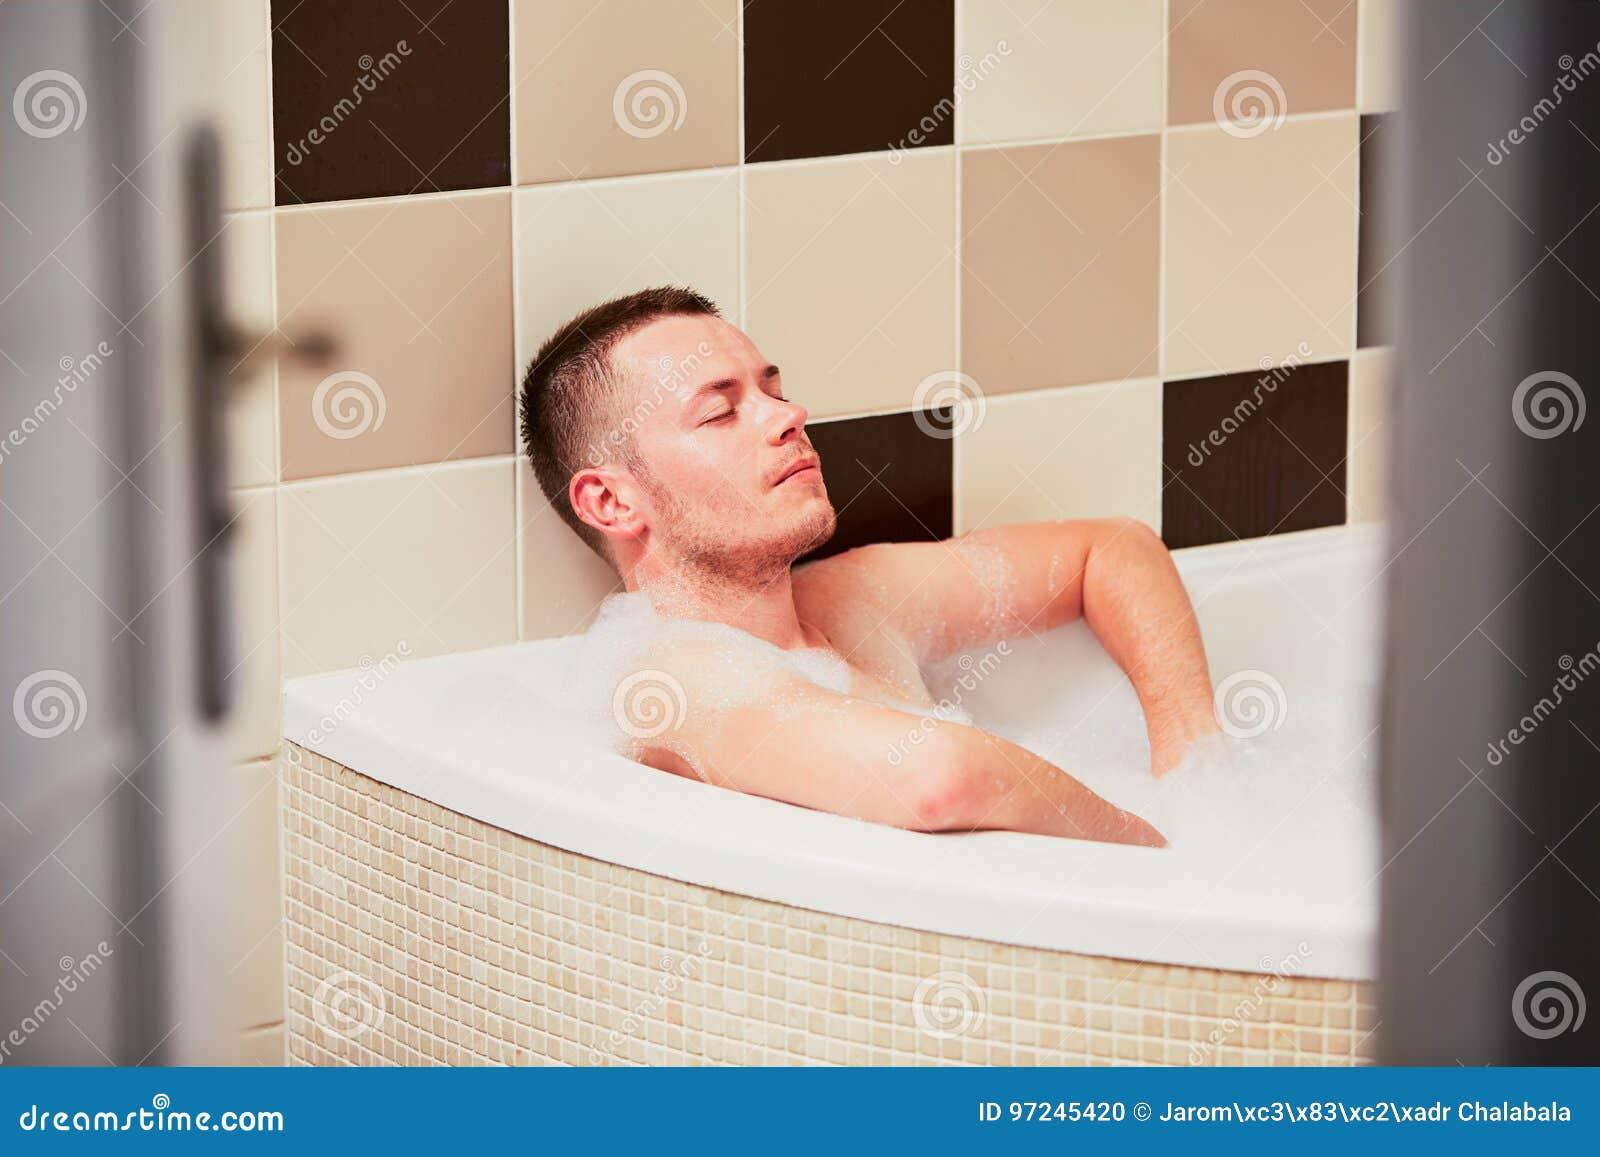 Begrundande i badrummet